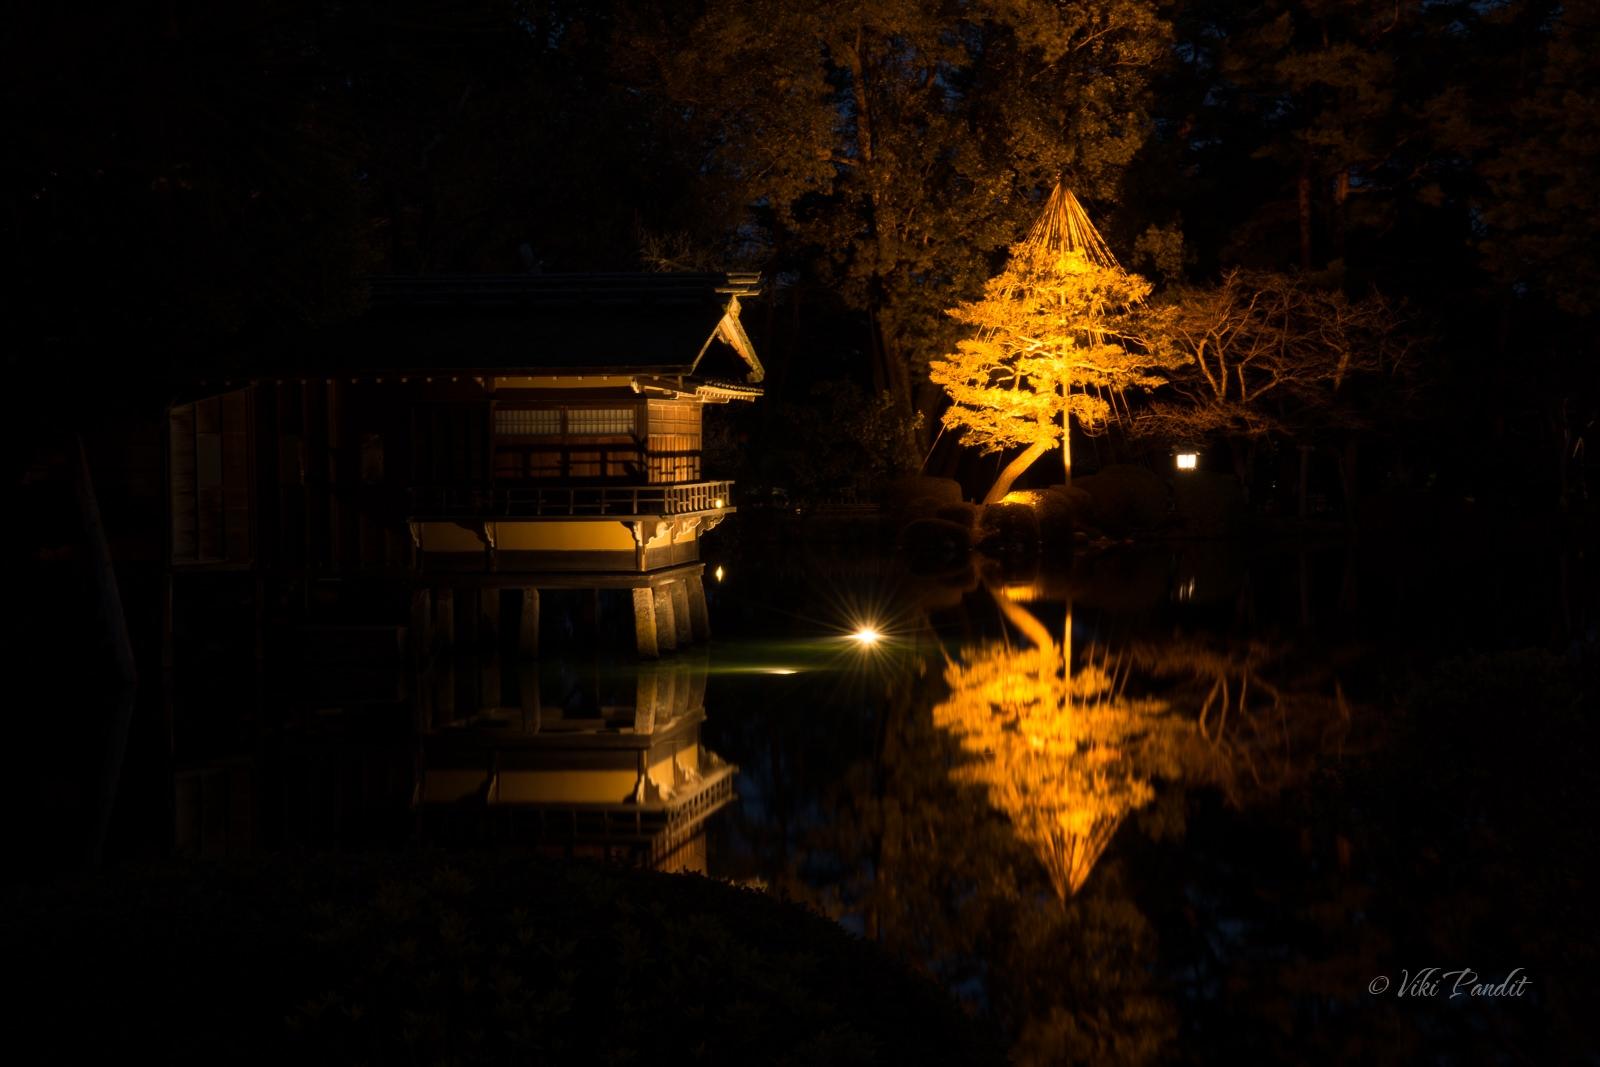 Uchihashi-tei Tea House, Kenrokuen